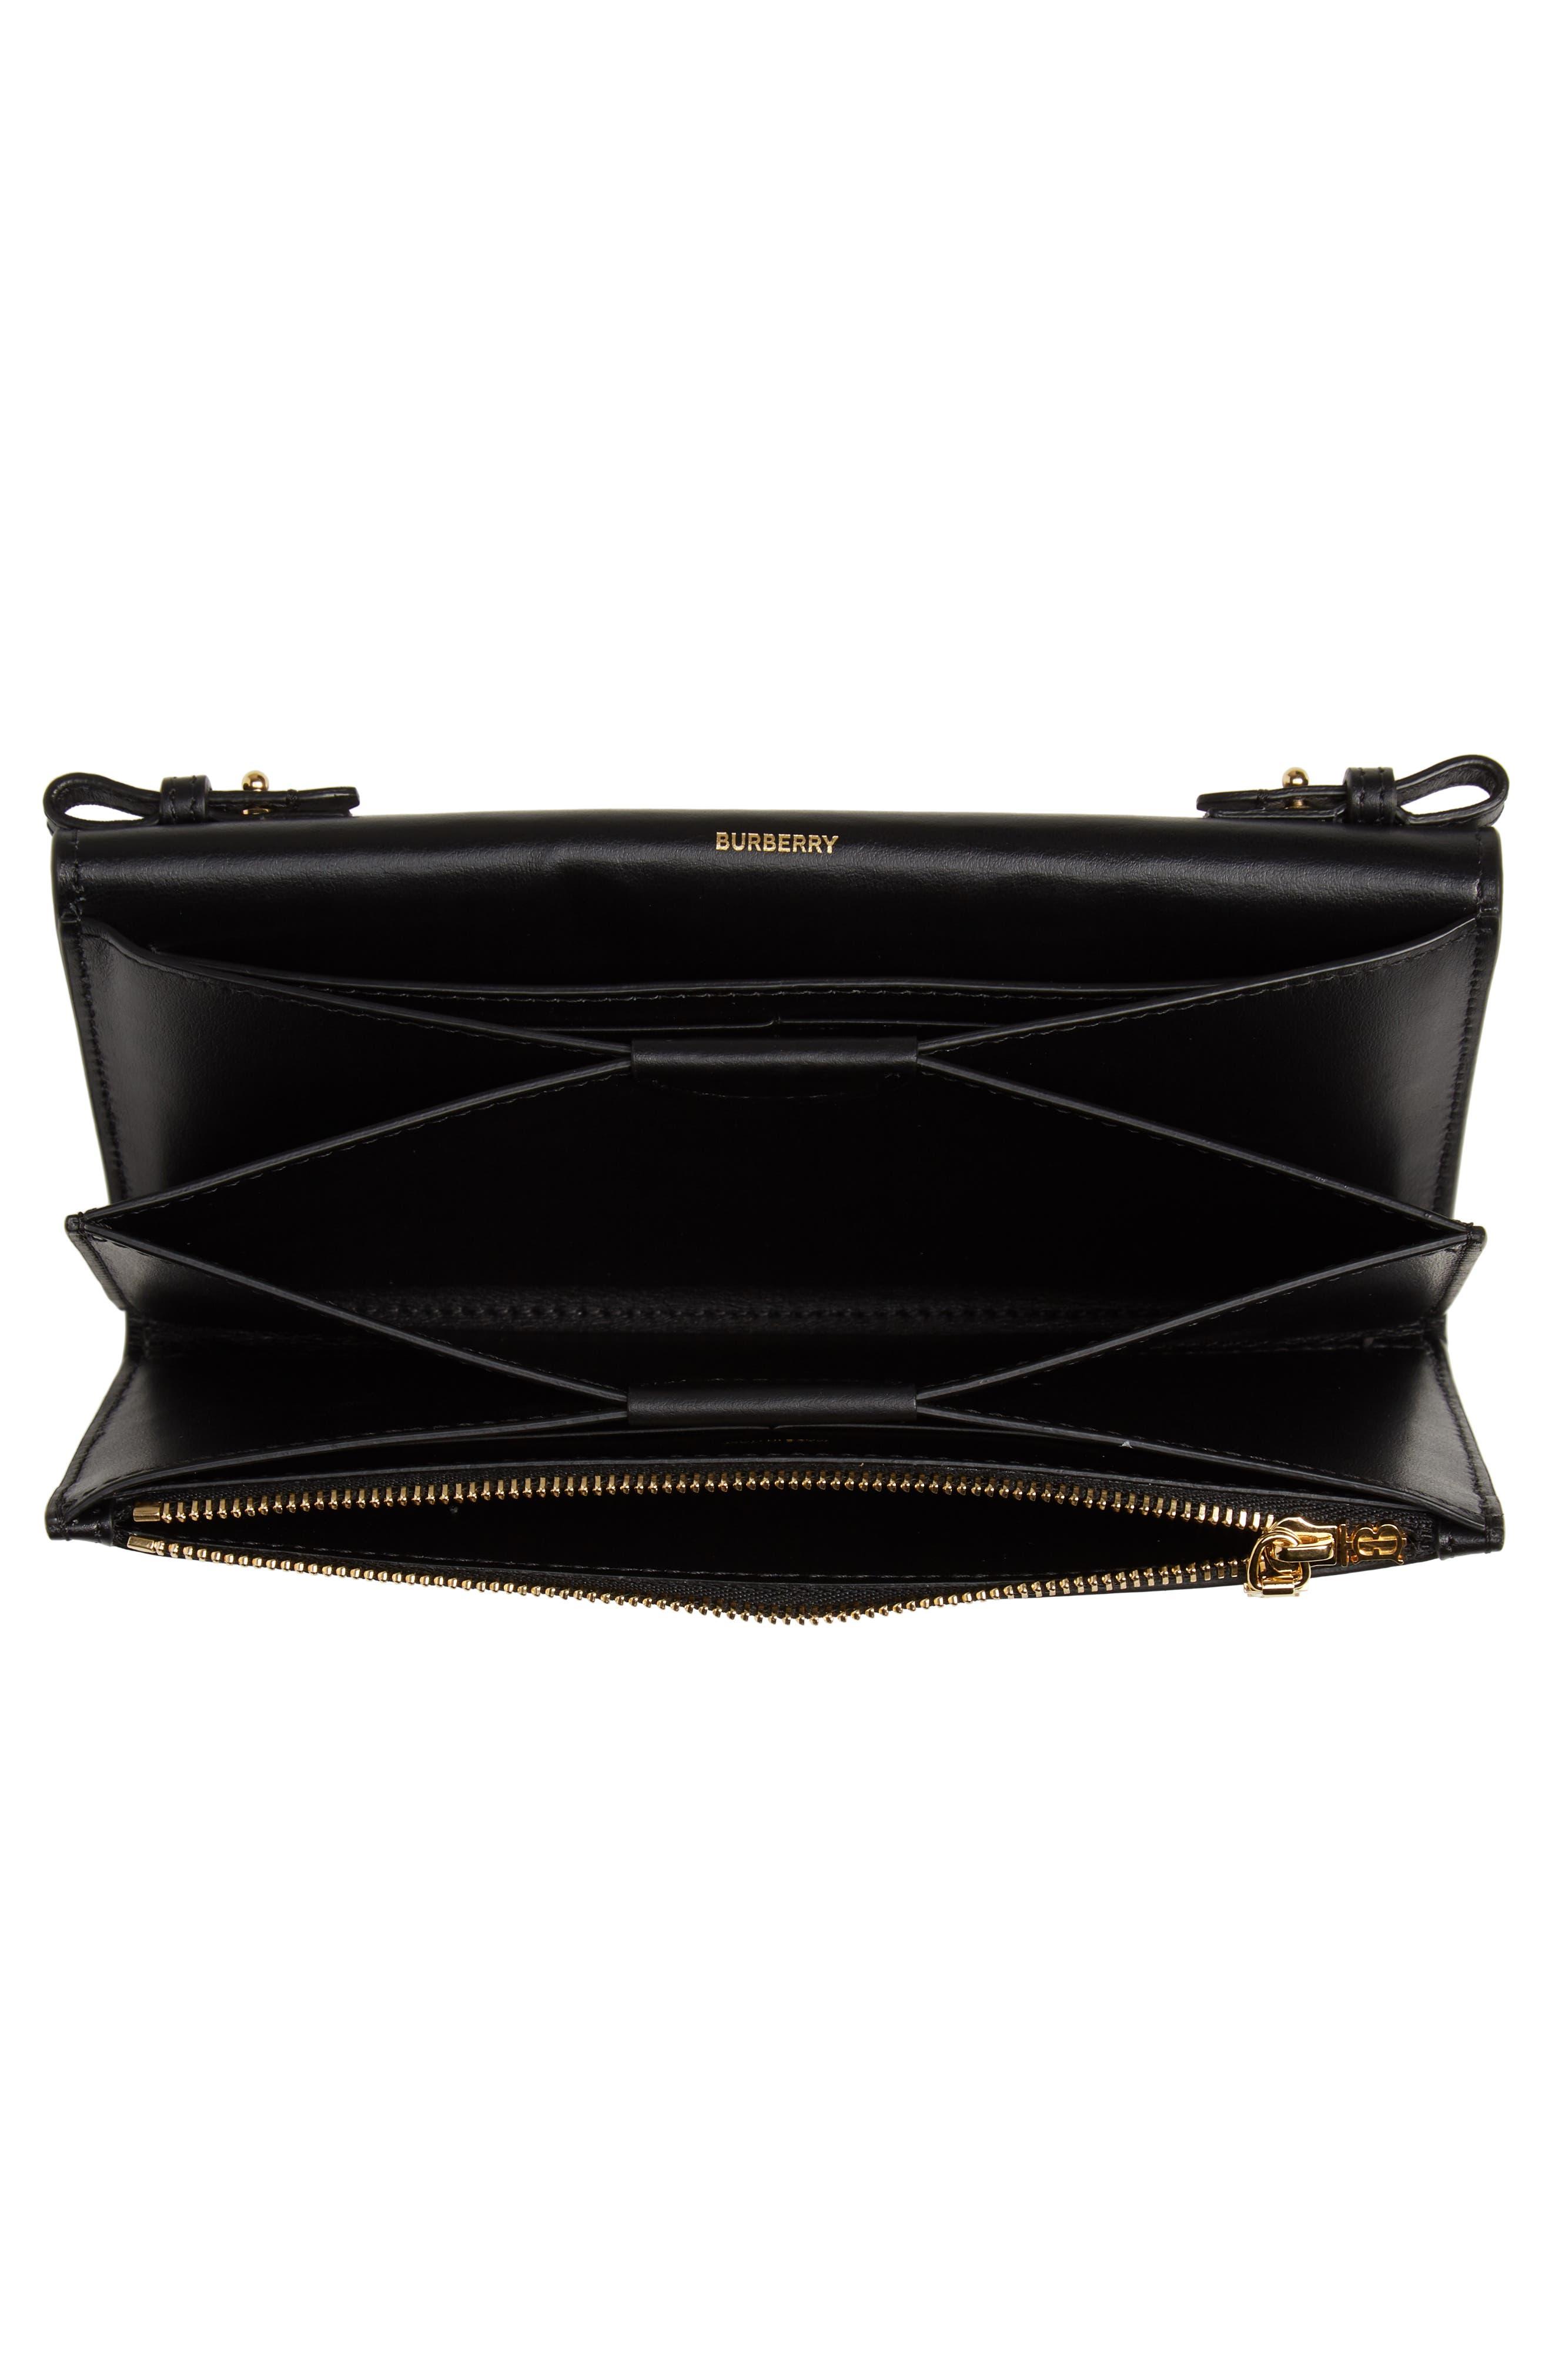 BURBERRY,                             Hazelmere Leather Crossbody Wallet,                             Alternate thumbnail 4, color,                             BLACK